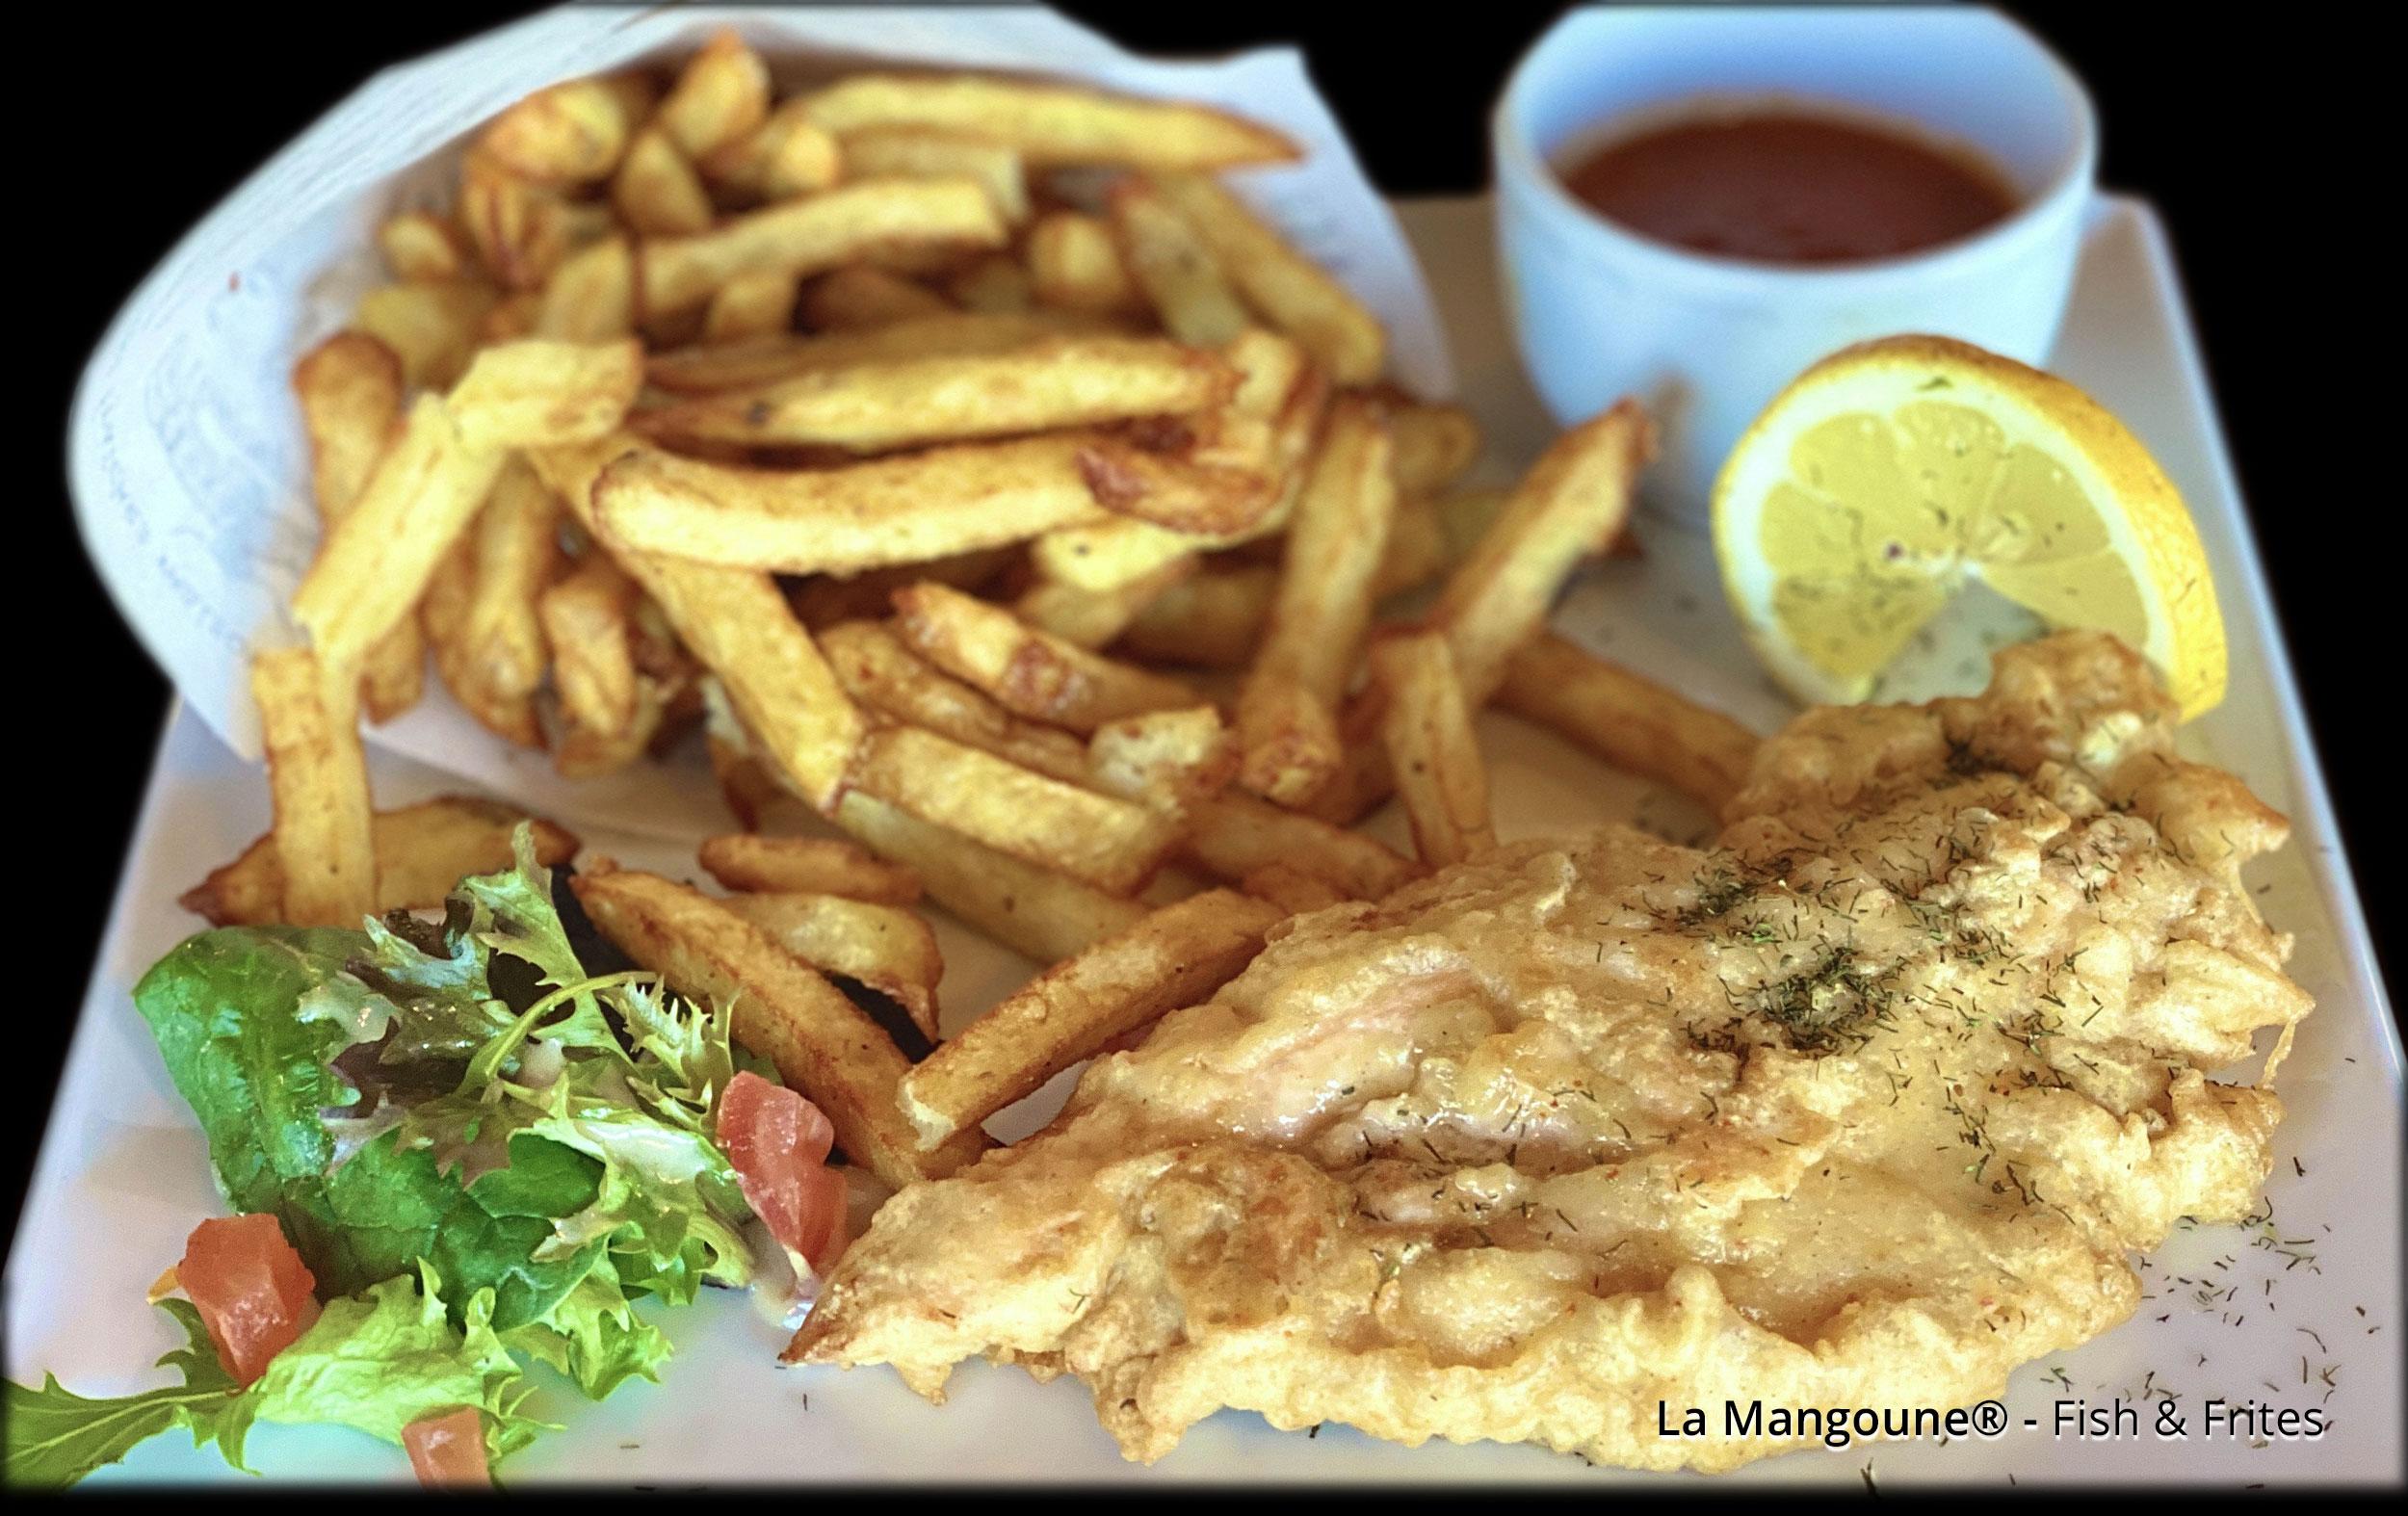 Fish & Frites